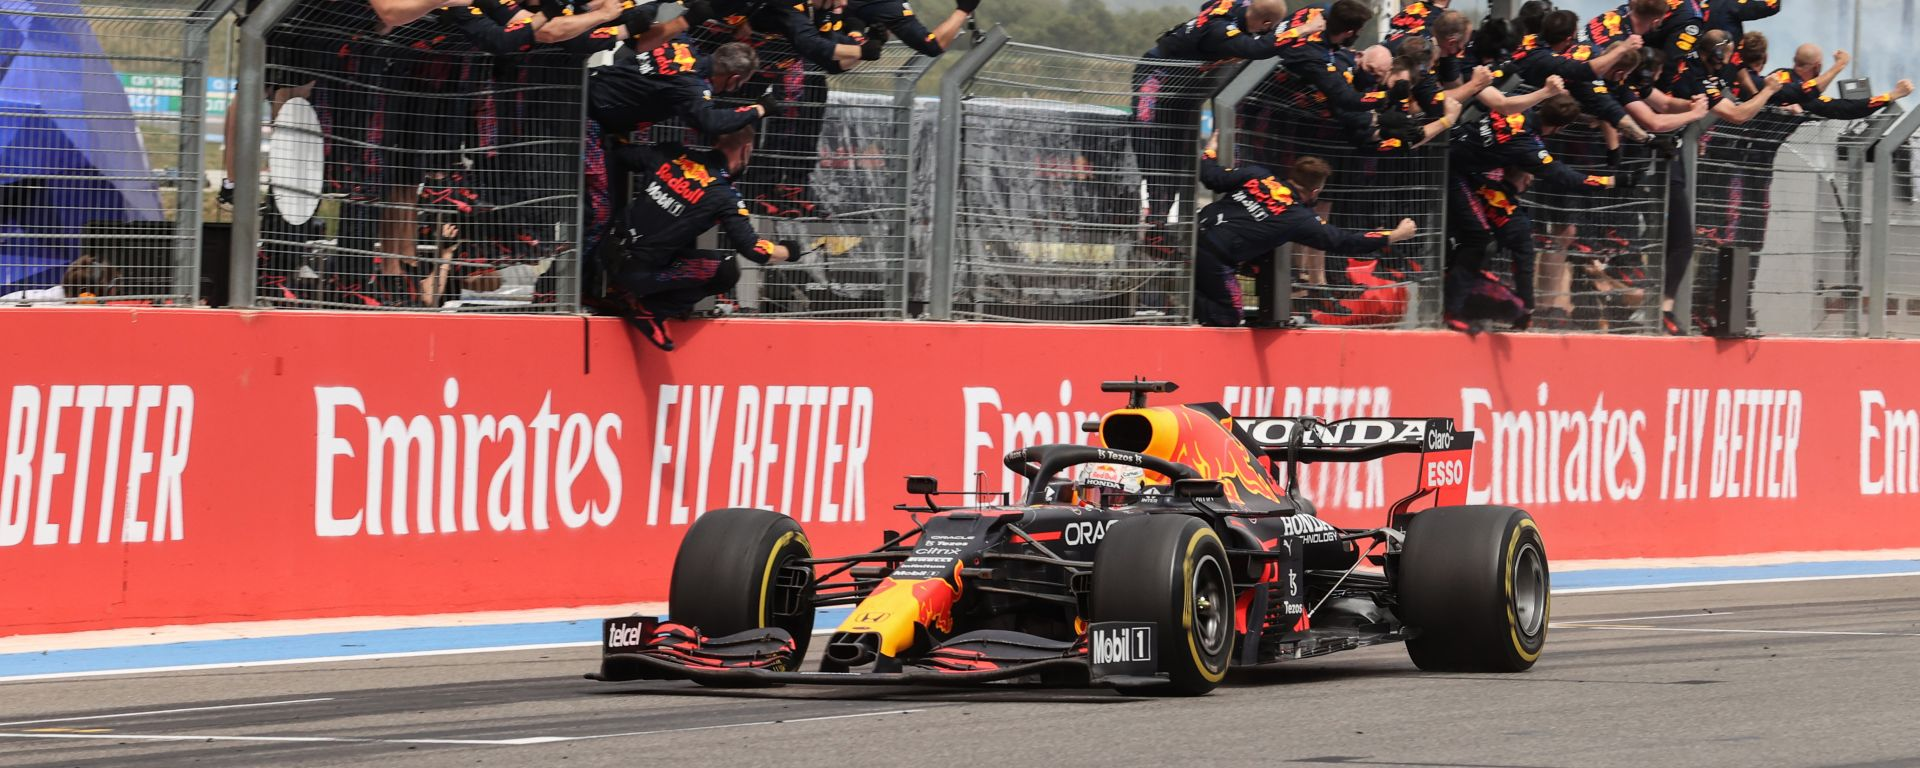 F1 GP Francia 2021, Le Castellet: Max Verstappen (Red Bull Racing) taglia il traguardo